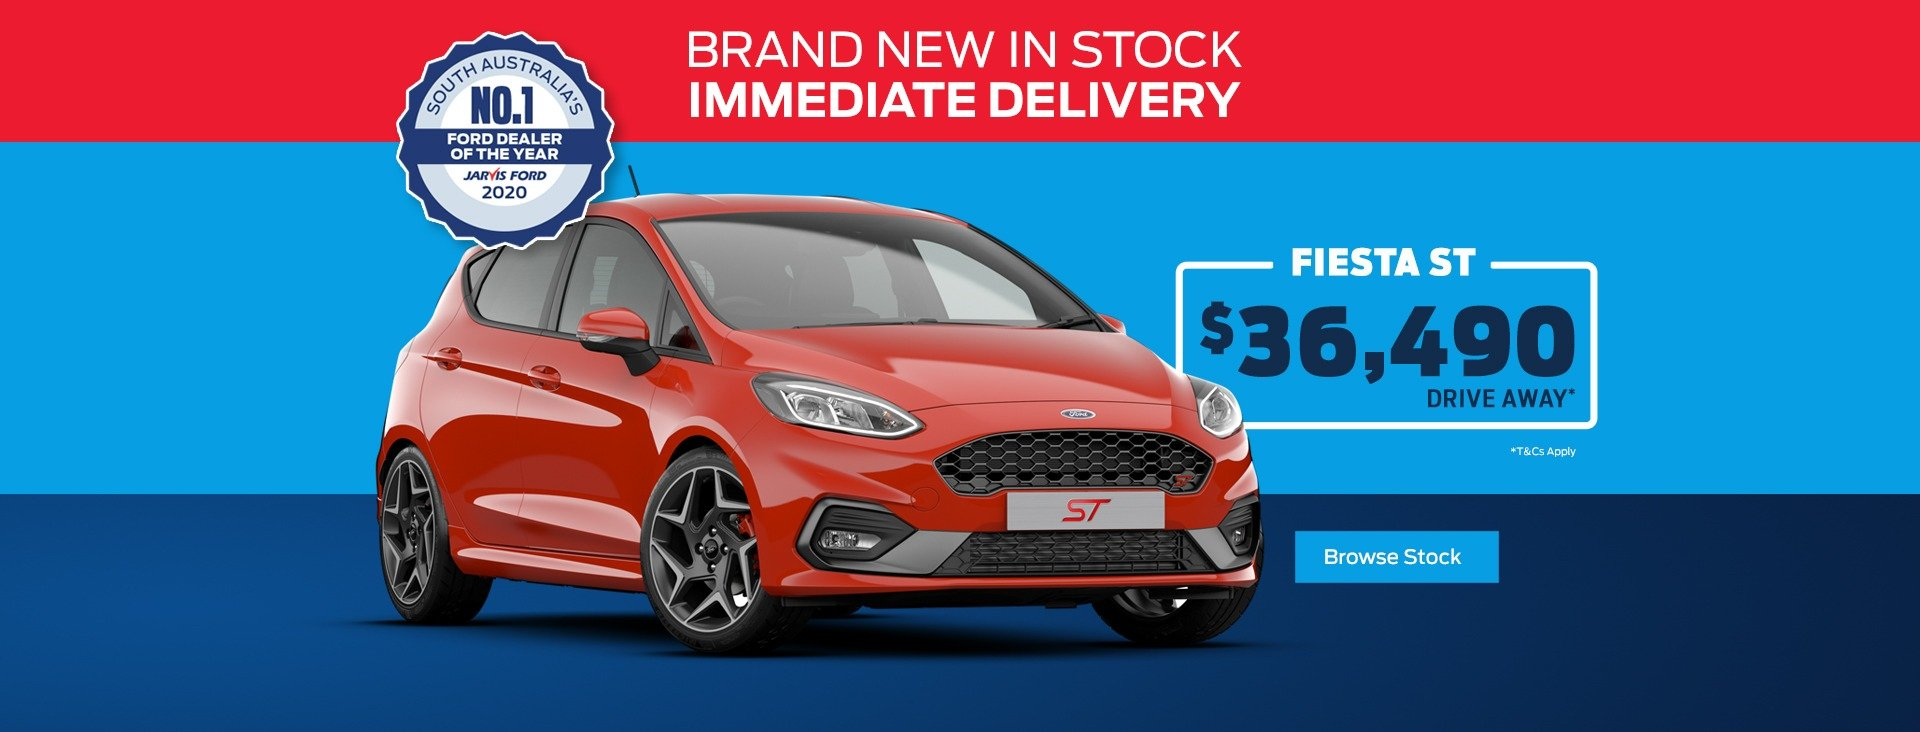 Ford Fiesta ST Offer